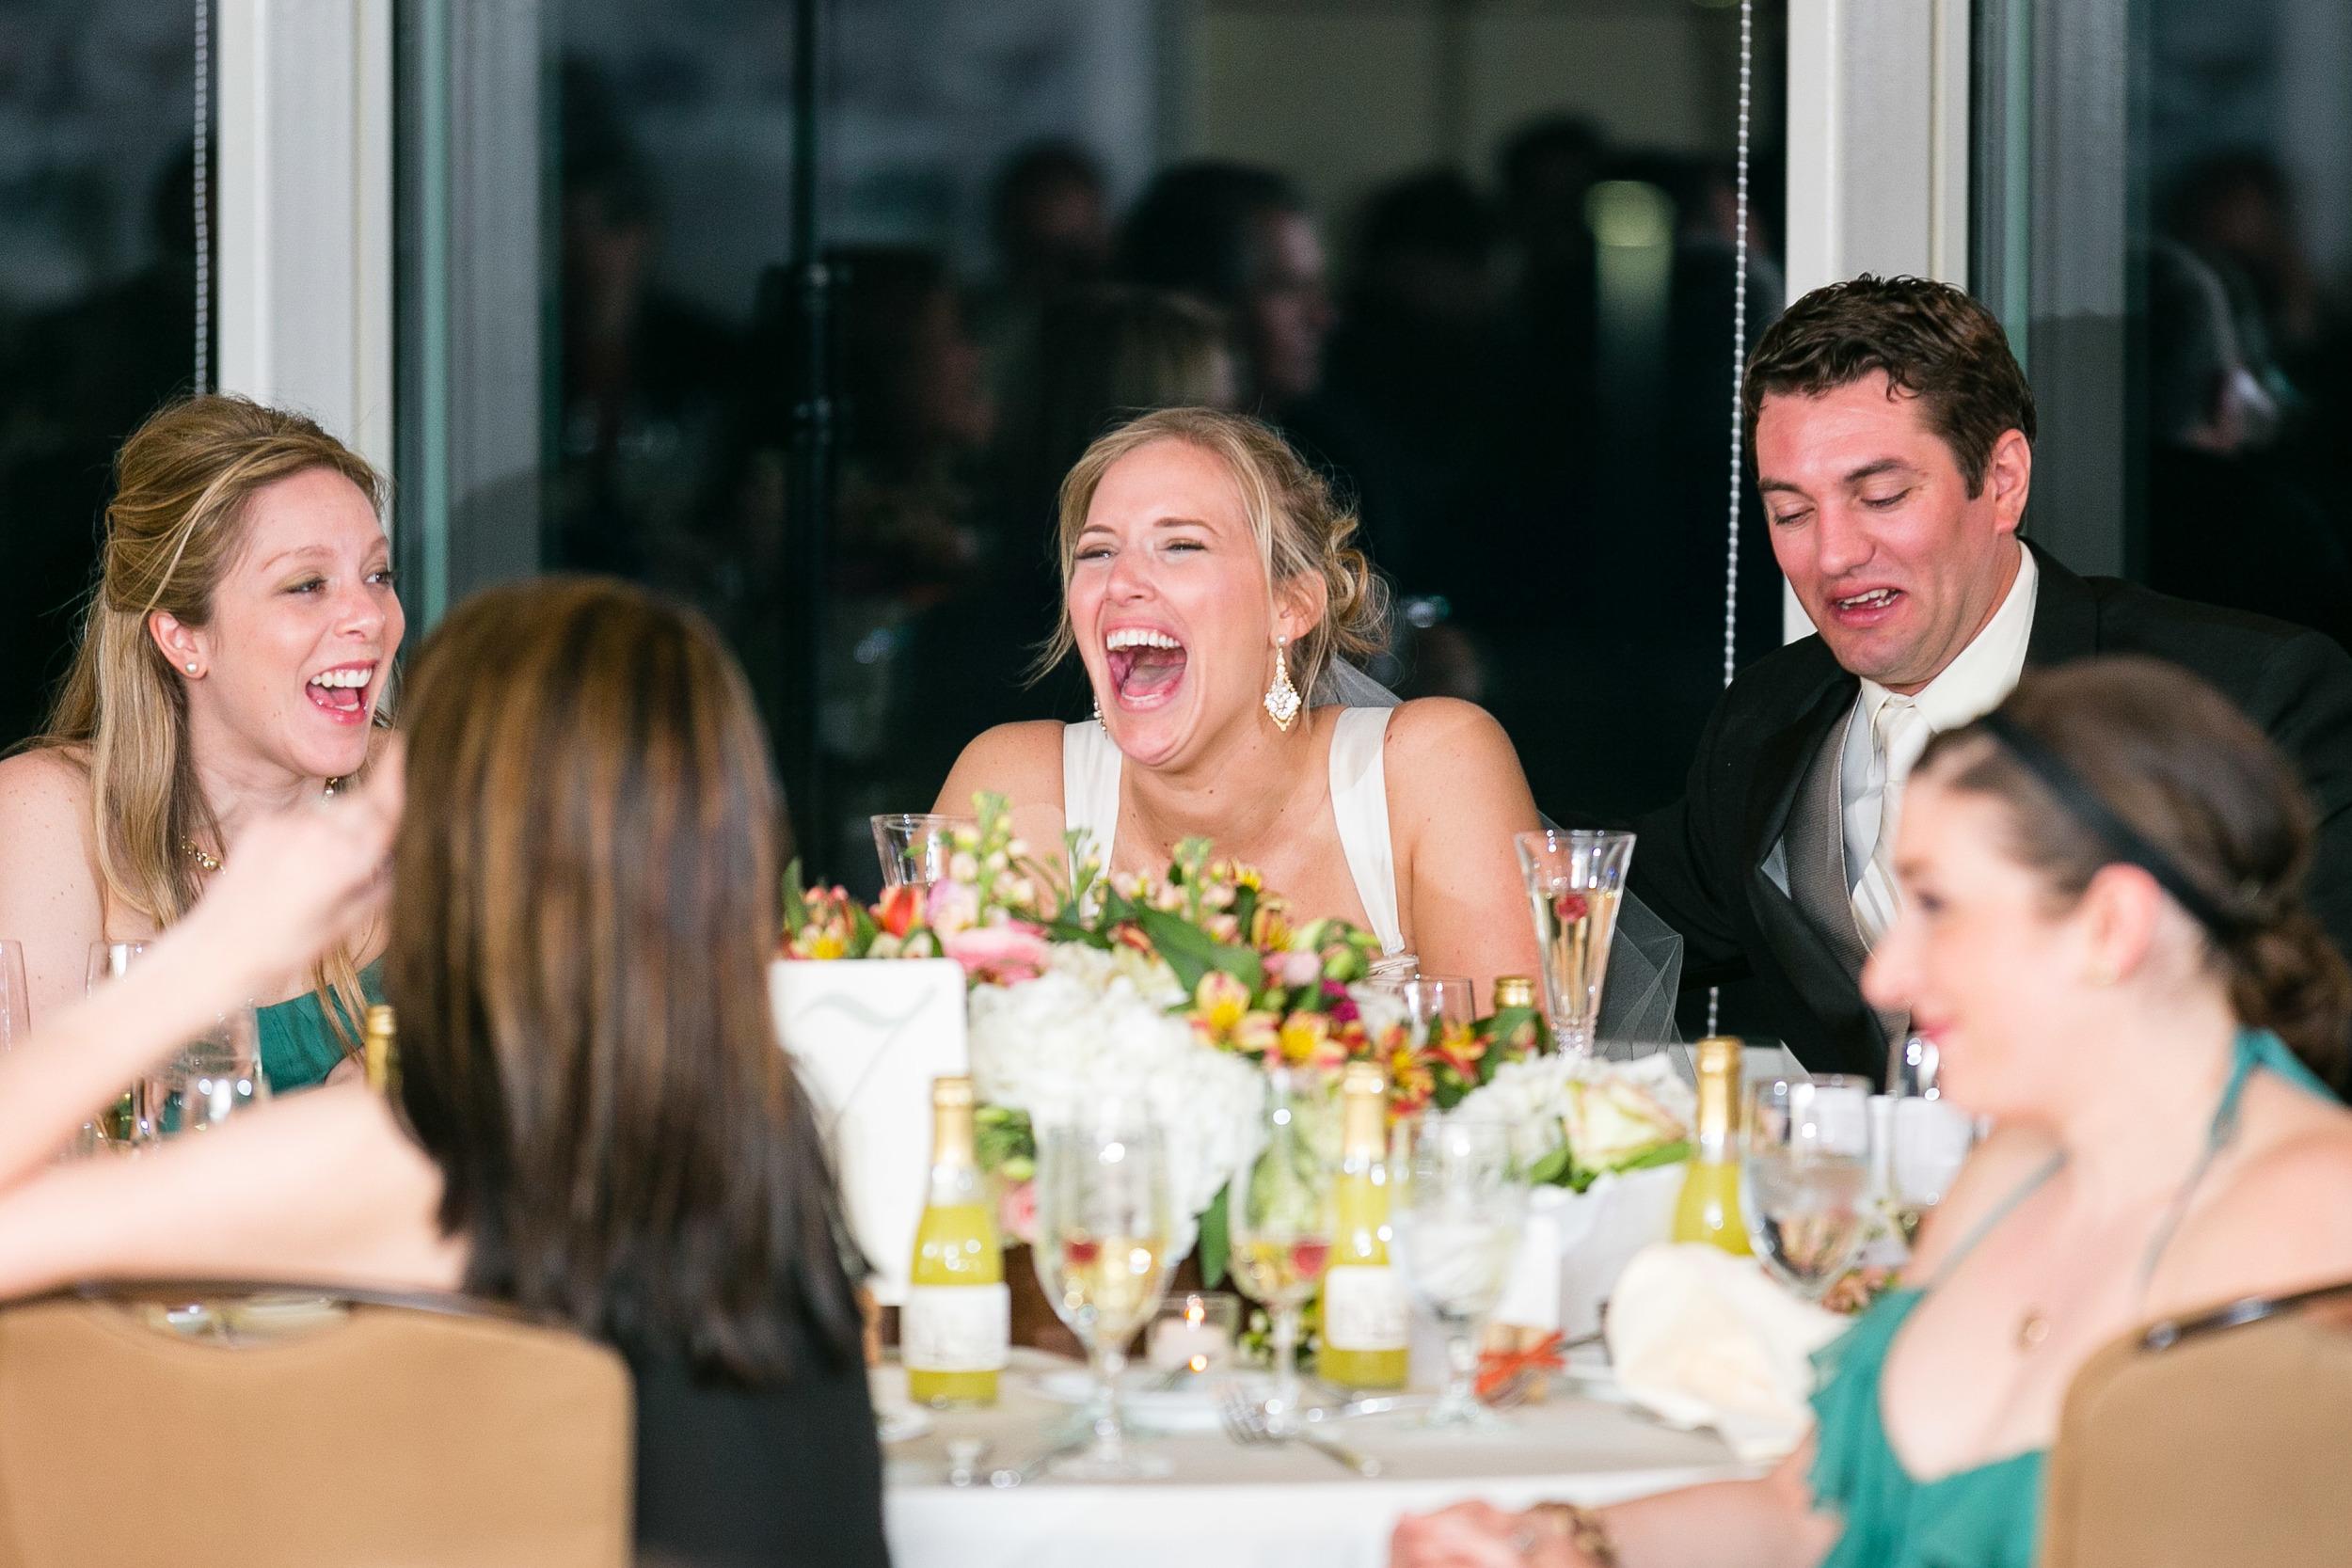 Romantic-Irish-Italian-Wedding-North-End-Boston-MA-Photojournalistic-Wedding-Photography-by-Jacek-Dolata-15.jpg